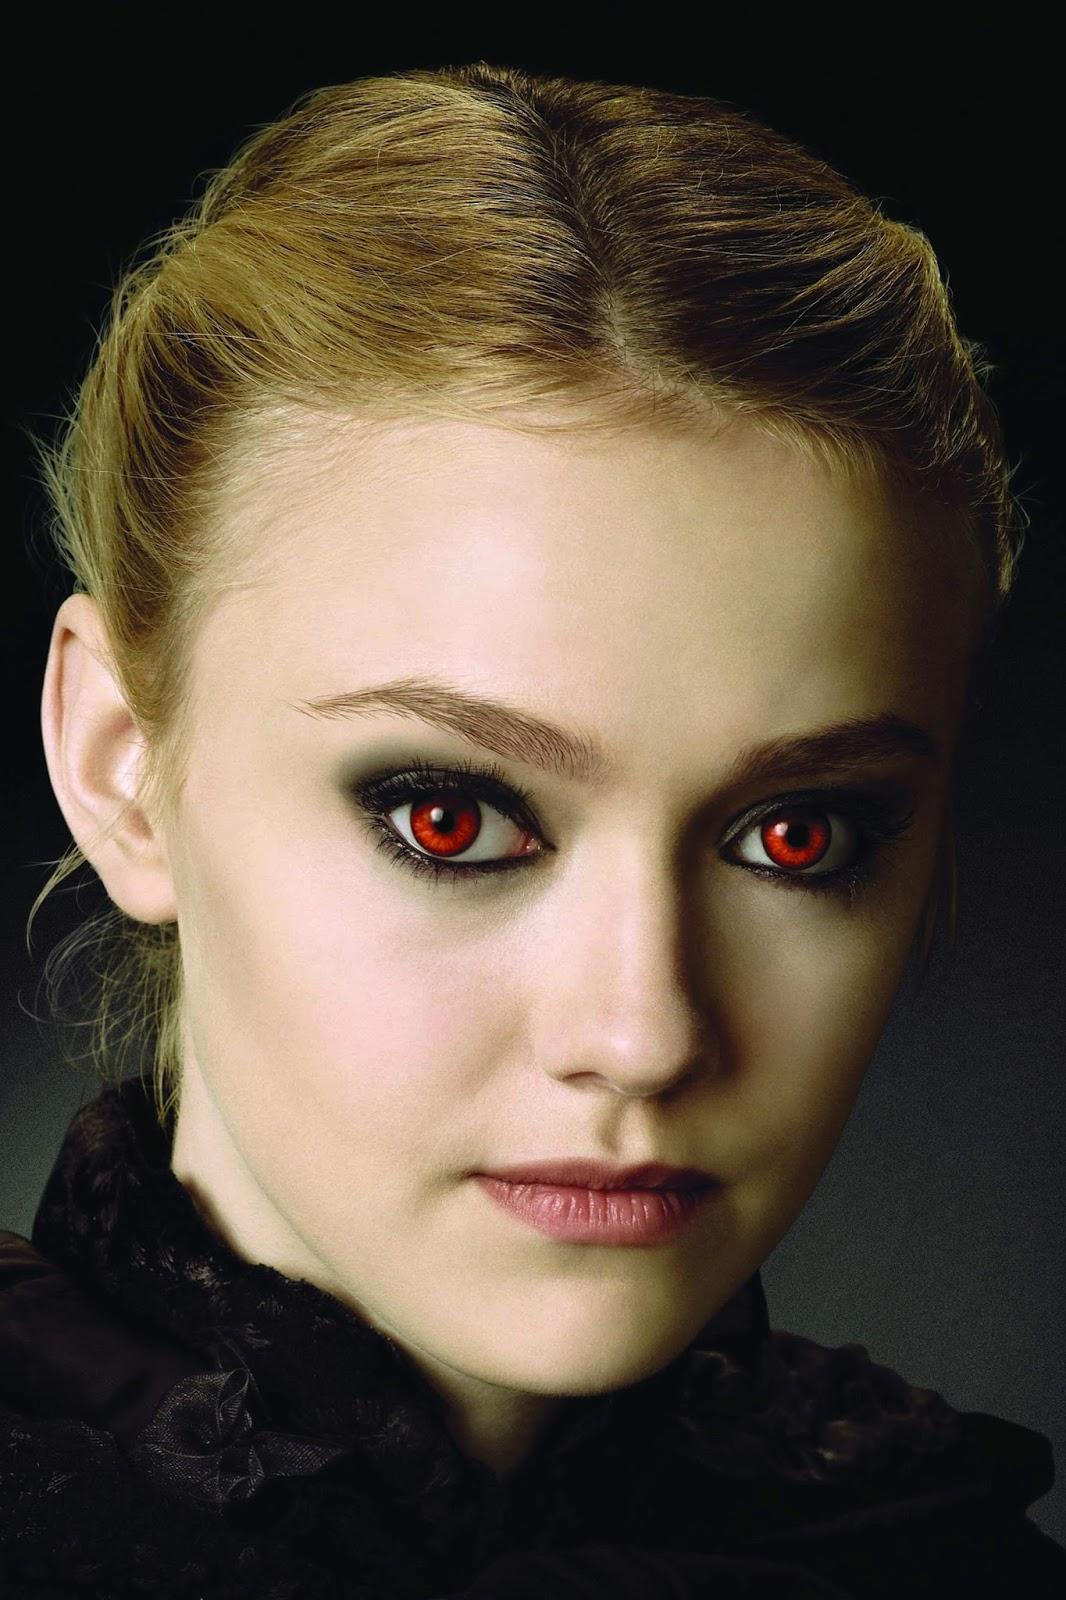 Jane Twilight Real Name